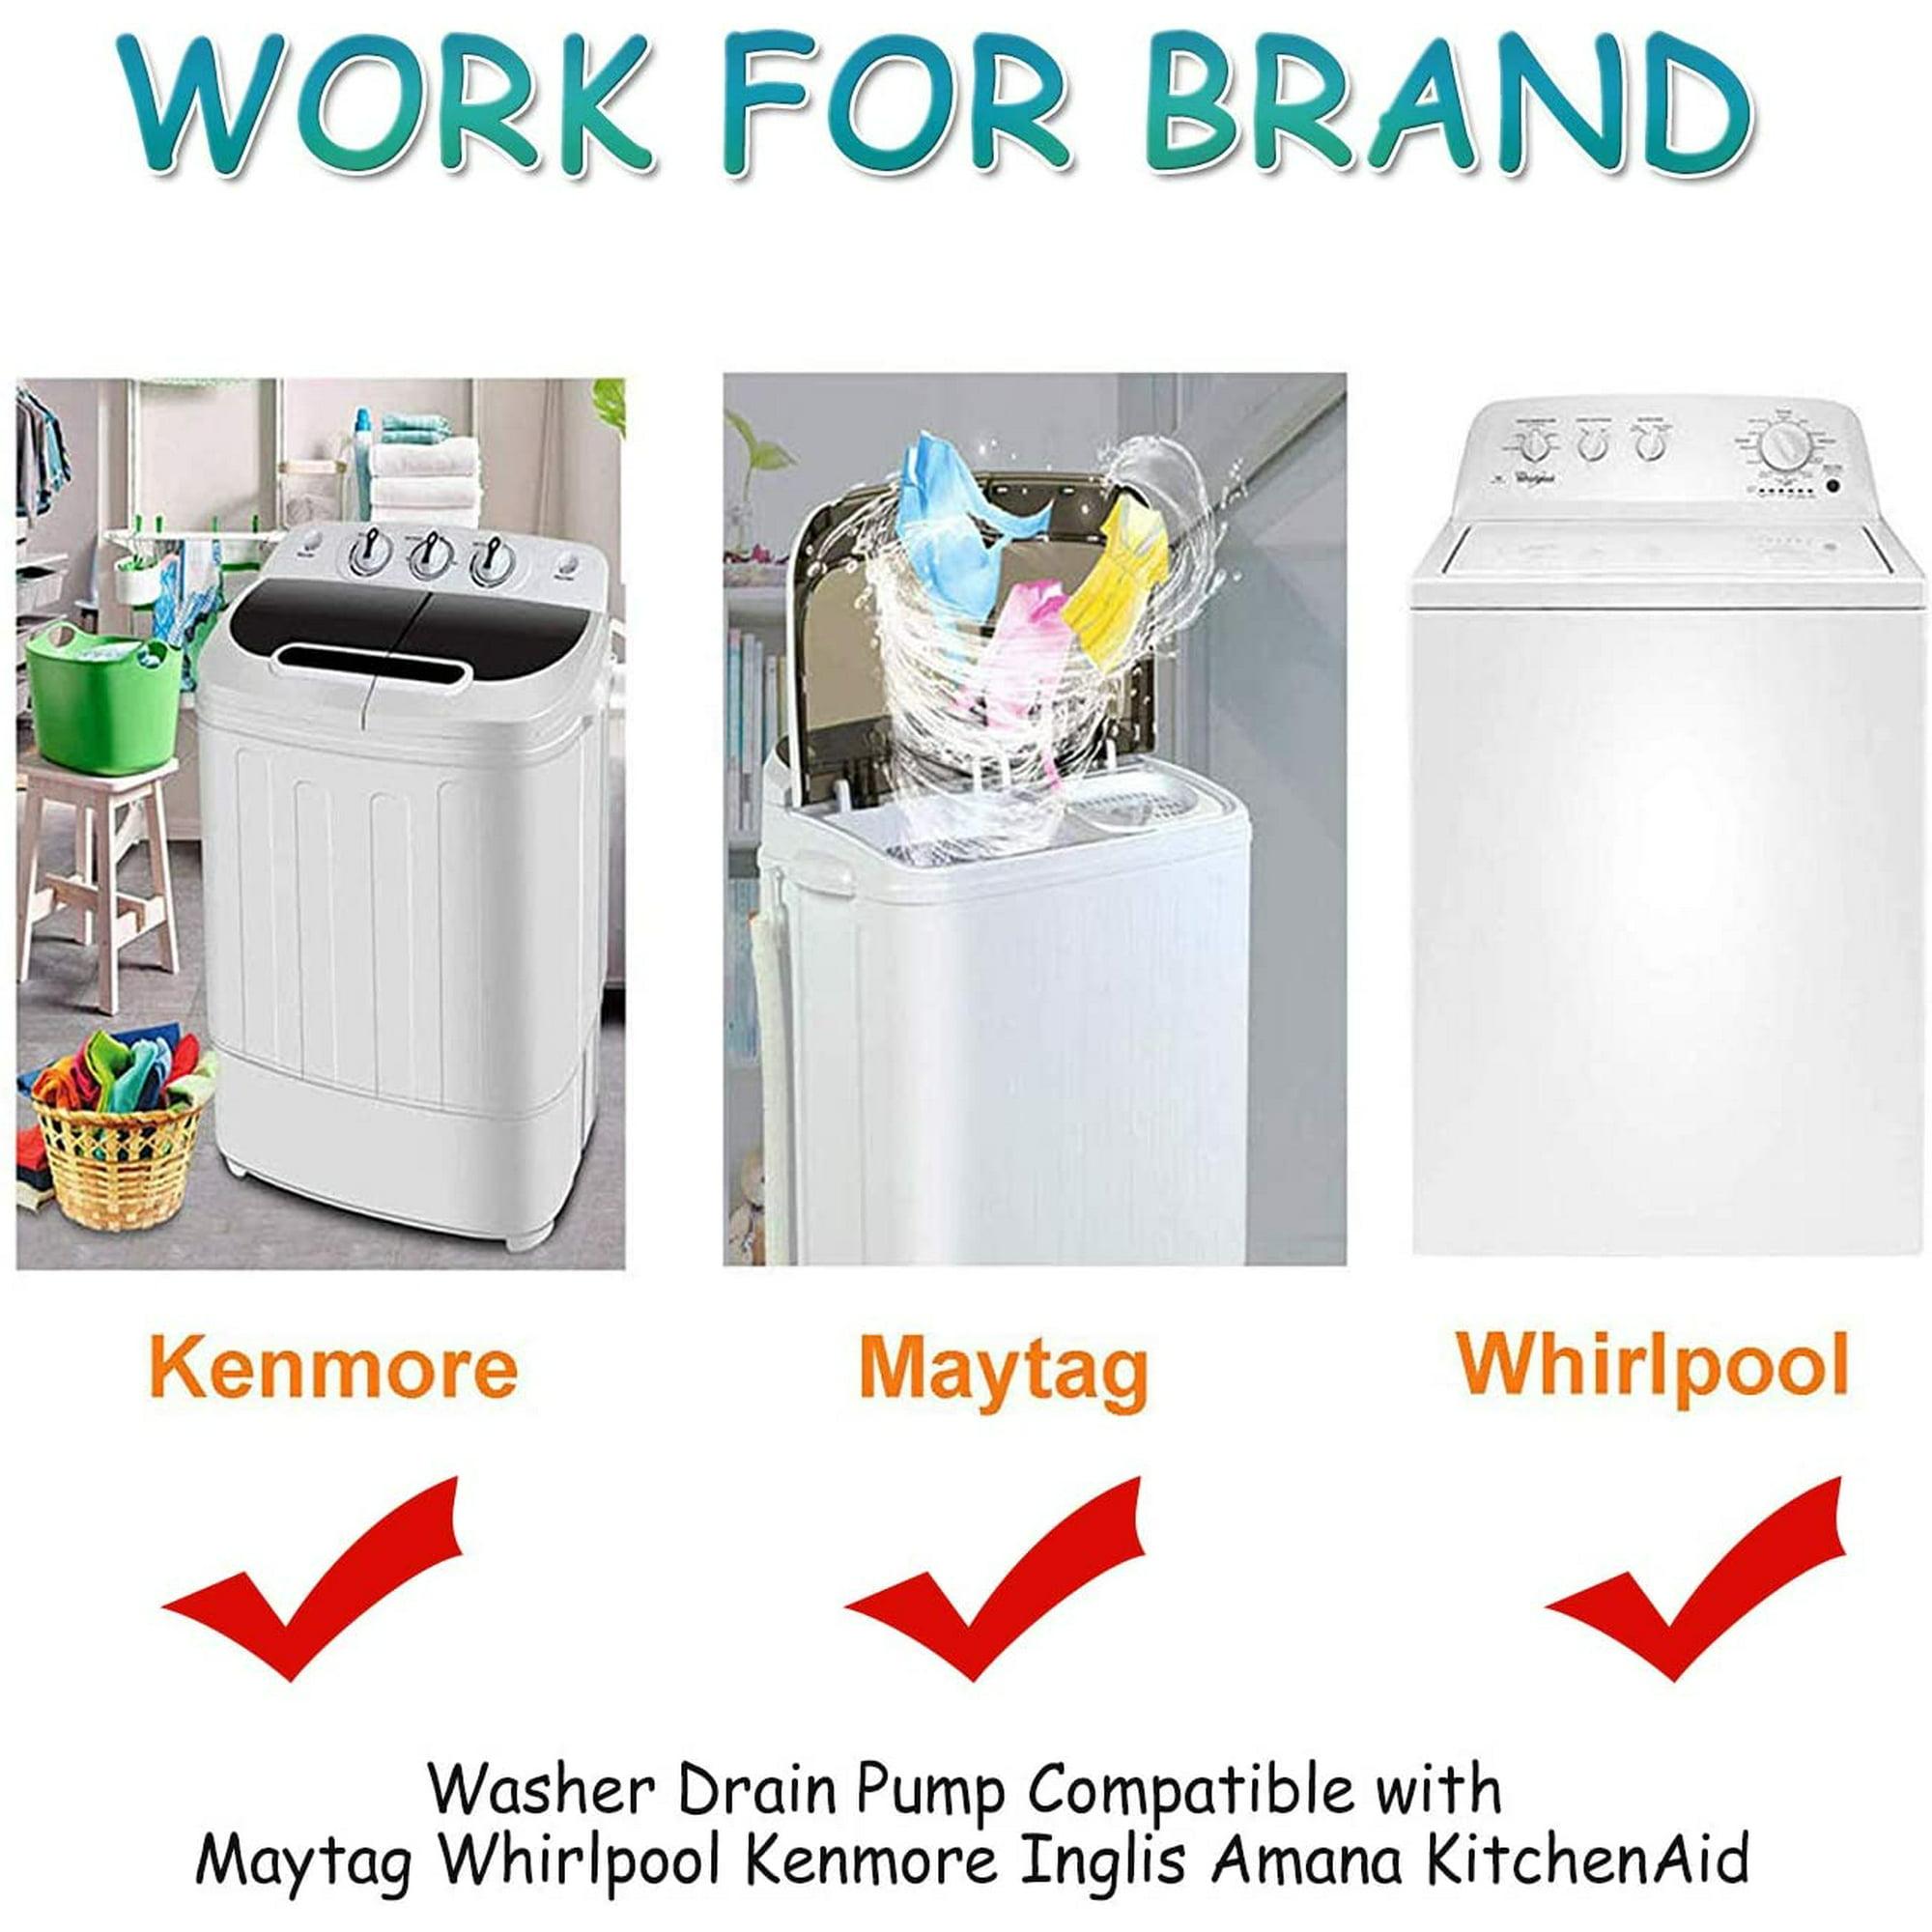 Whirlpool Maytag Kenmore Washer Drain Pump Motor  8182821  280187